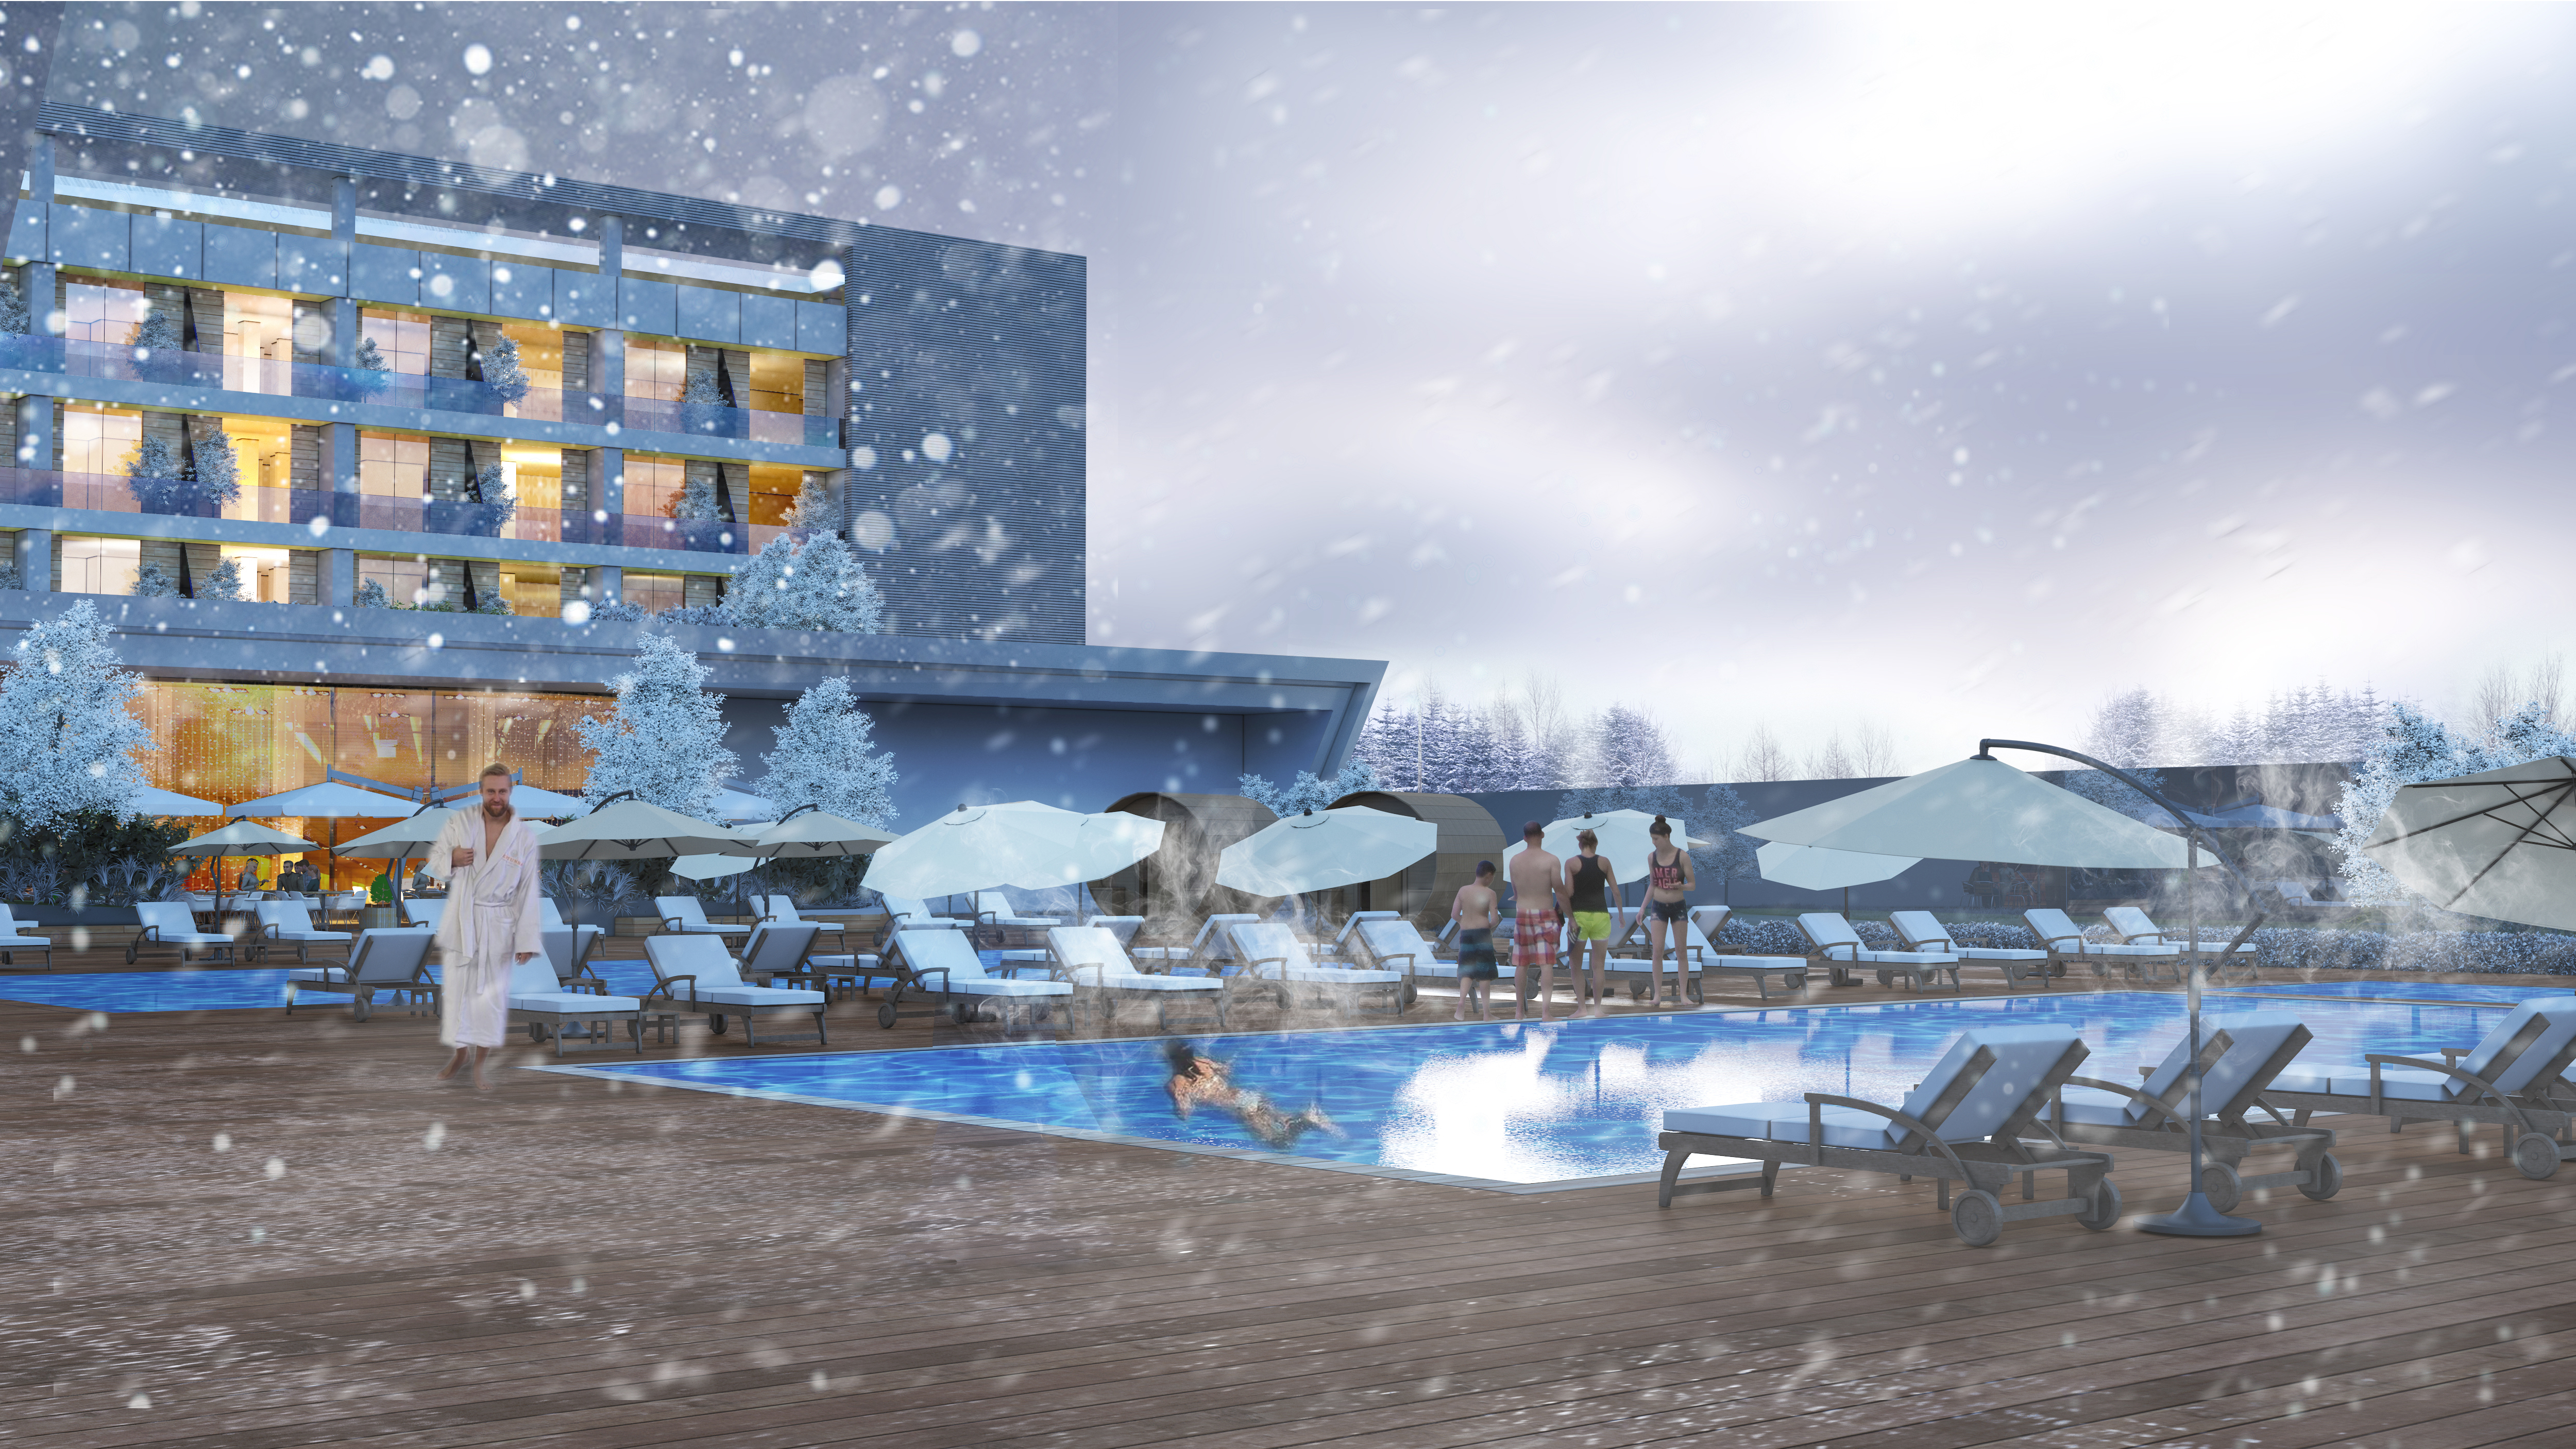 Thermal Pool Deck